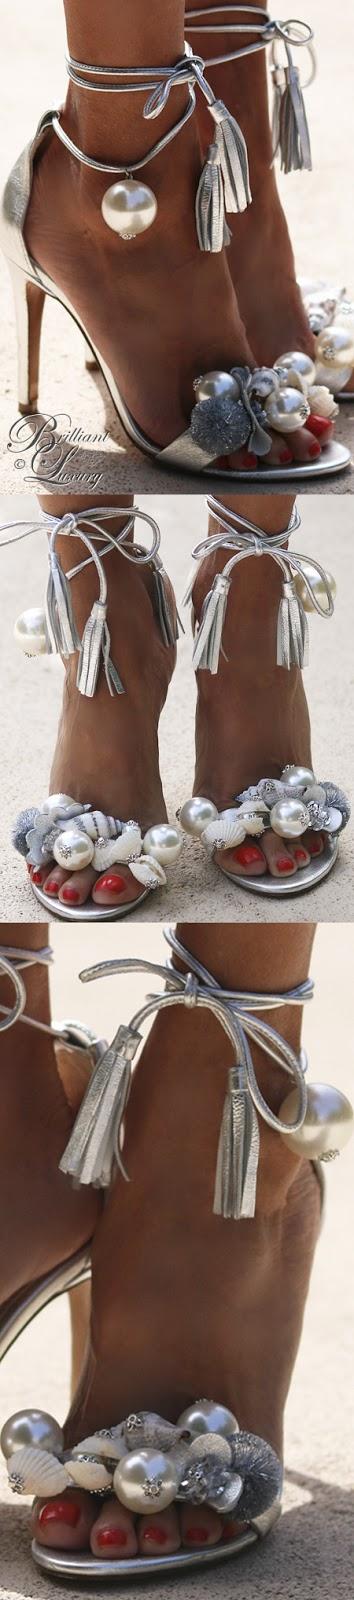 Brilliant Luxury ♦ Alameda Turquesa Dona Ana sandals golden